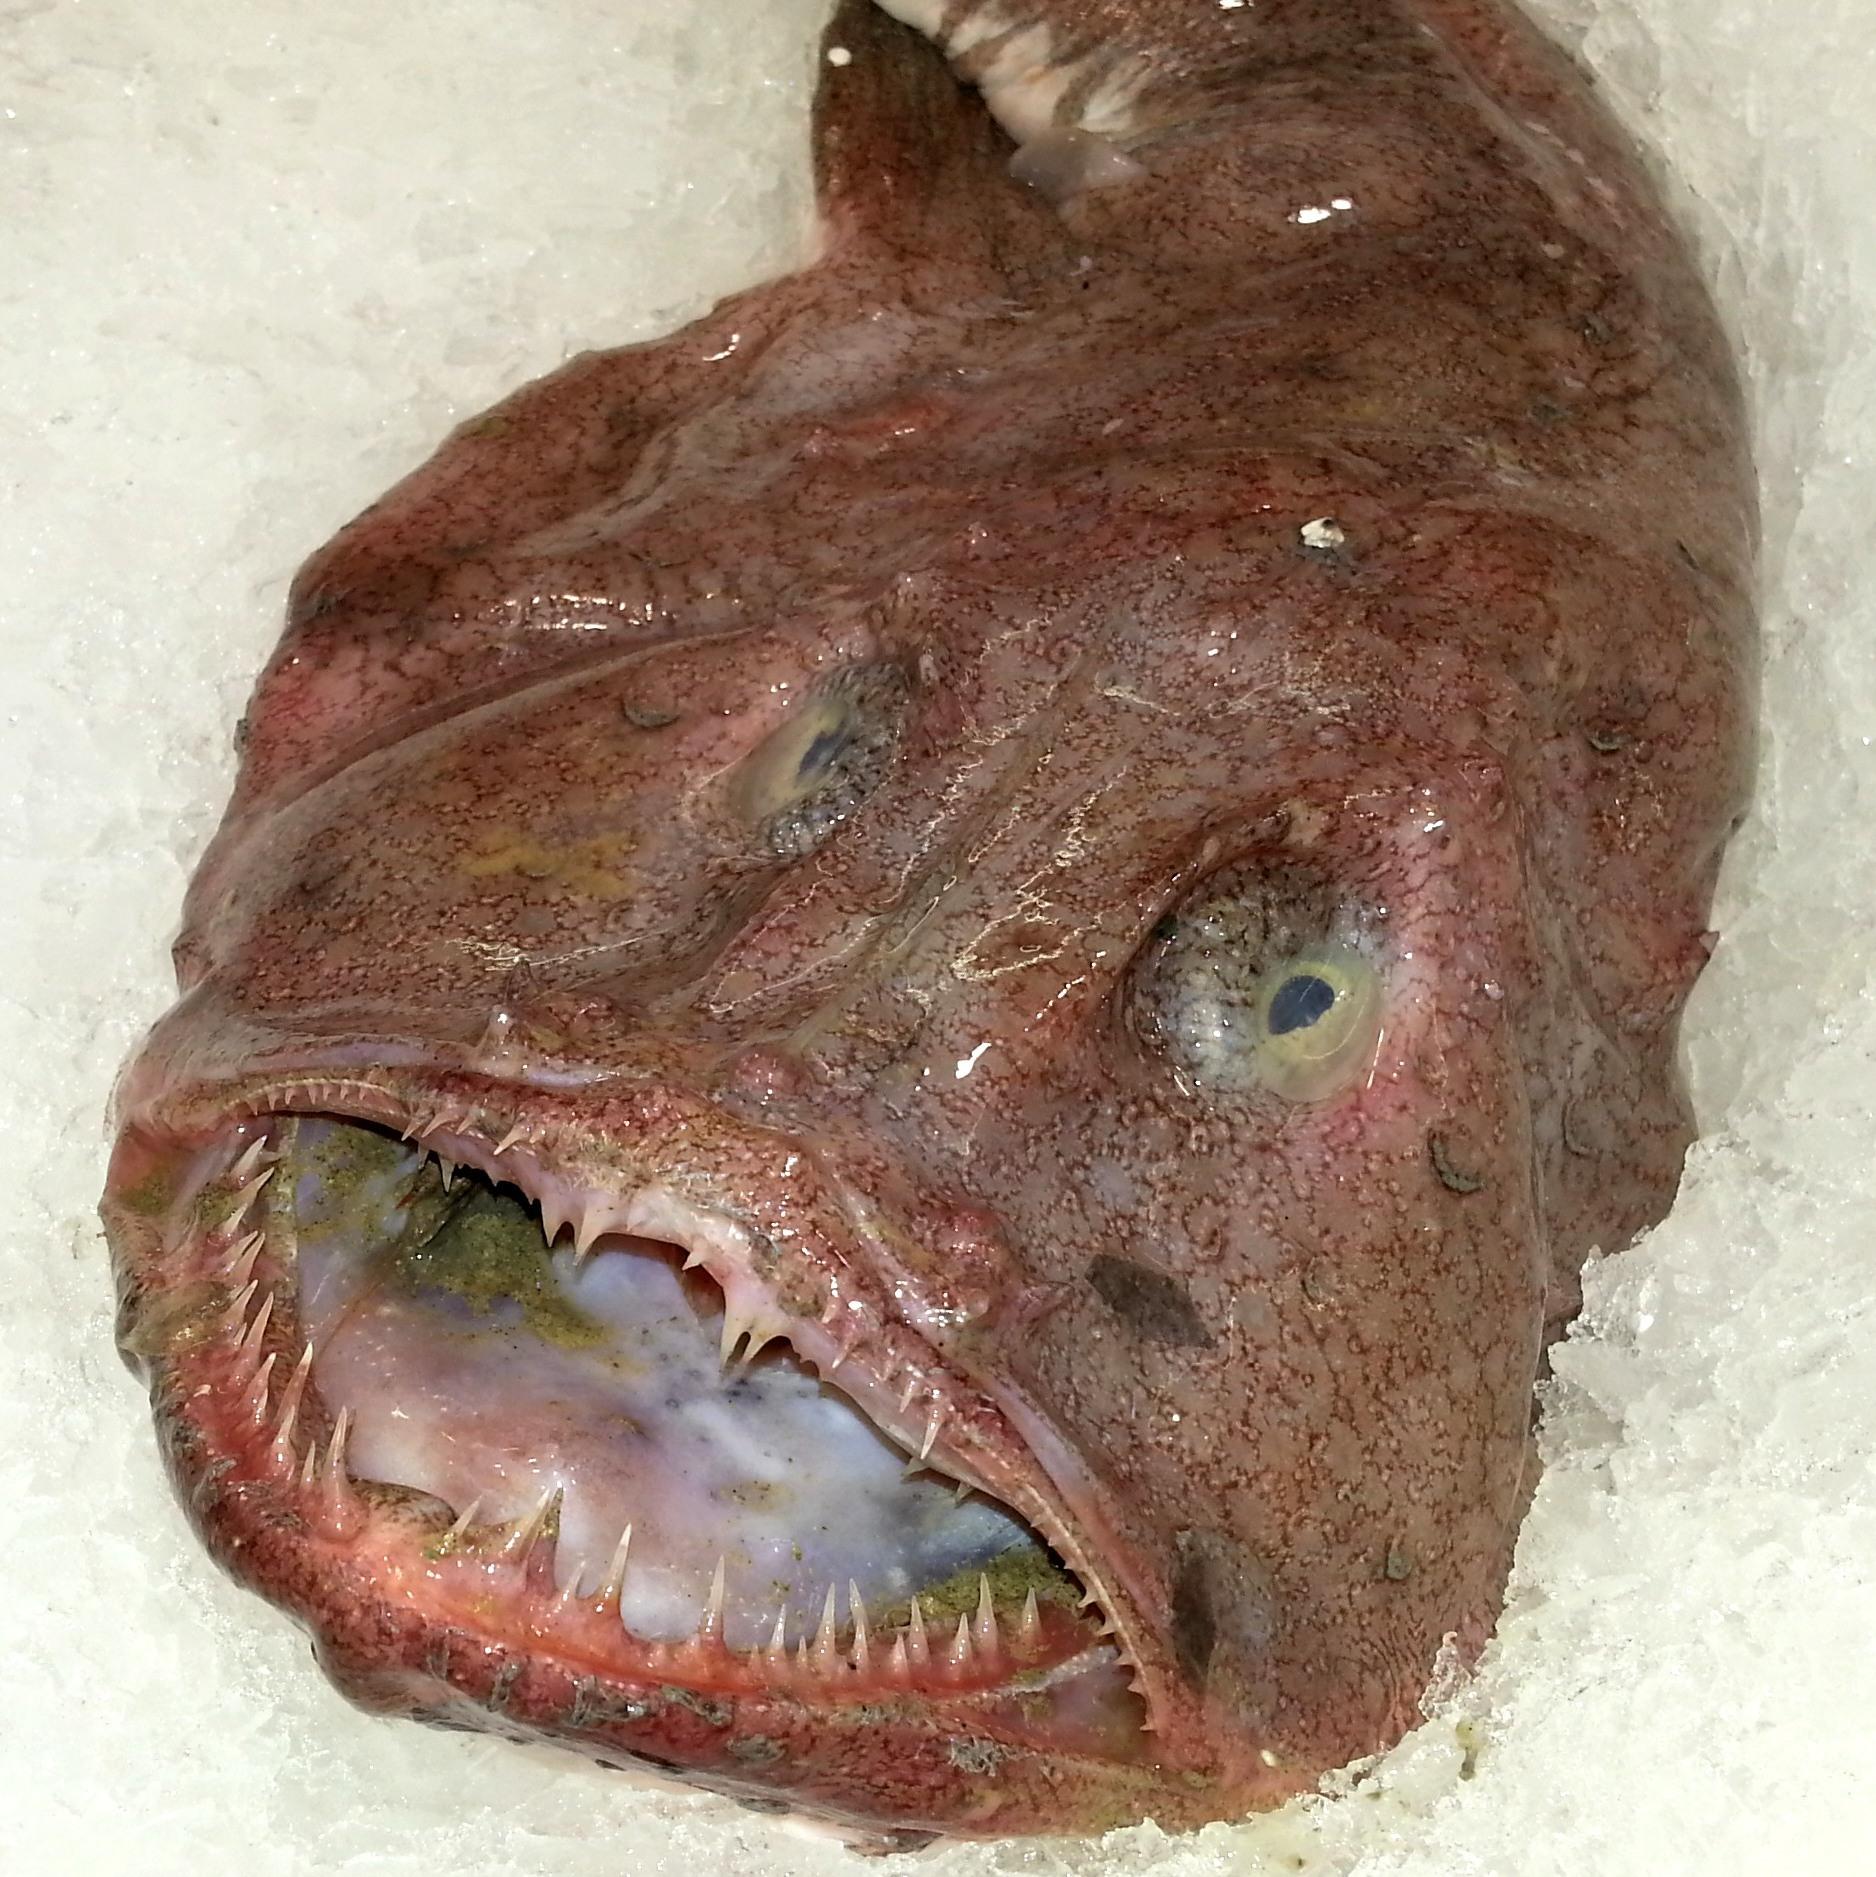 Рыба-красотка, прилавок Метро, Аланья, Турция